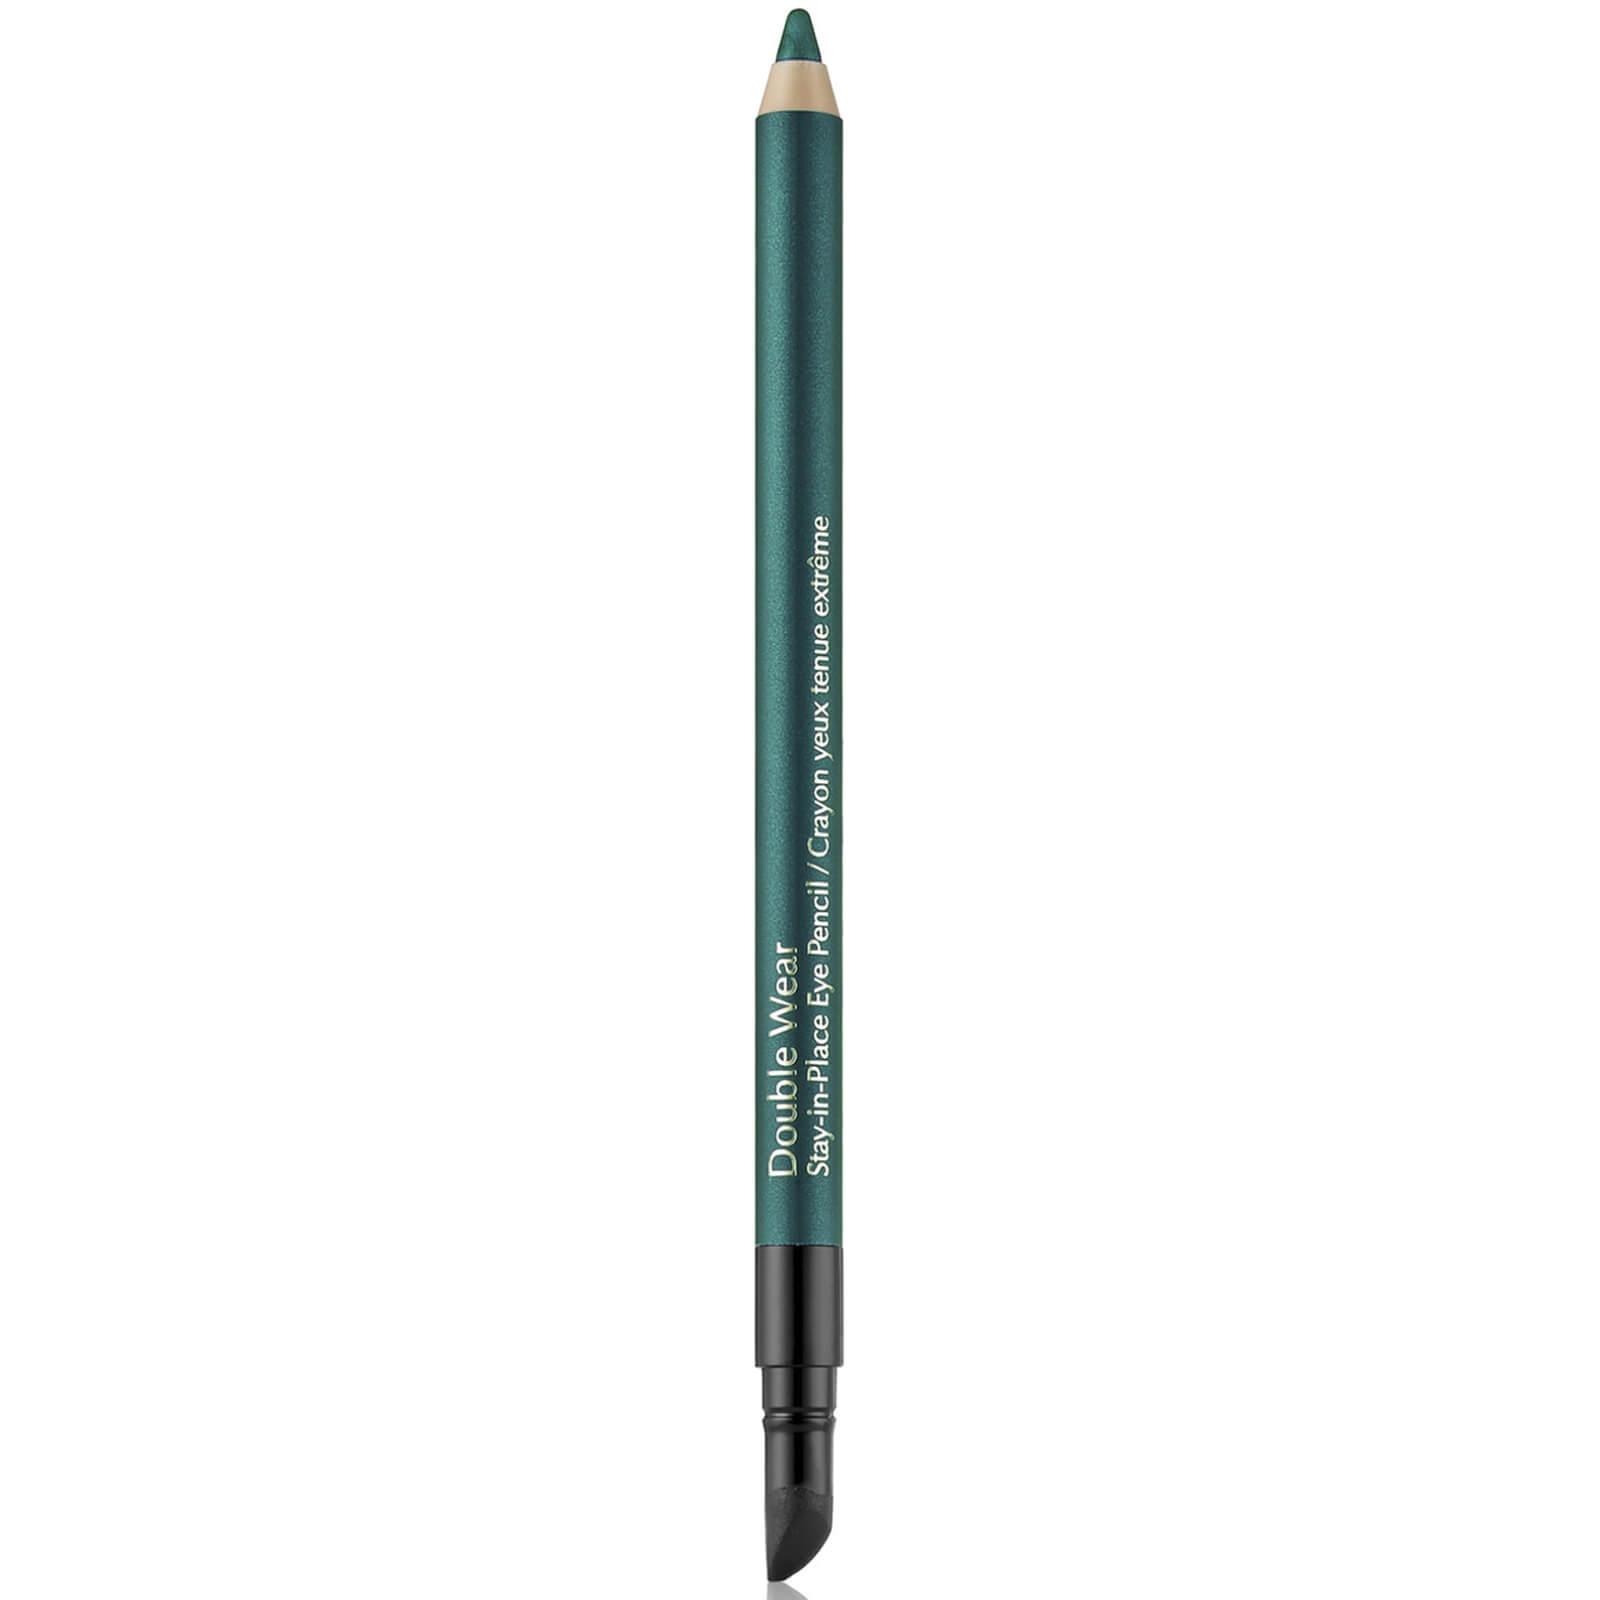 Купить Estée Lauder Double Wear Stay-in-Place Eye Pencil 1.2g - Emerald Volt